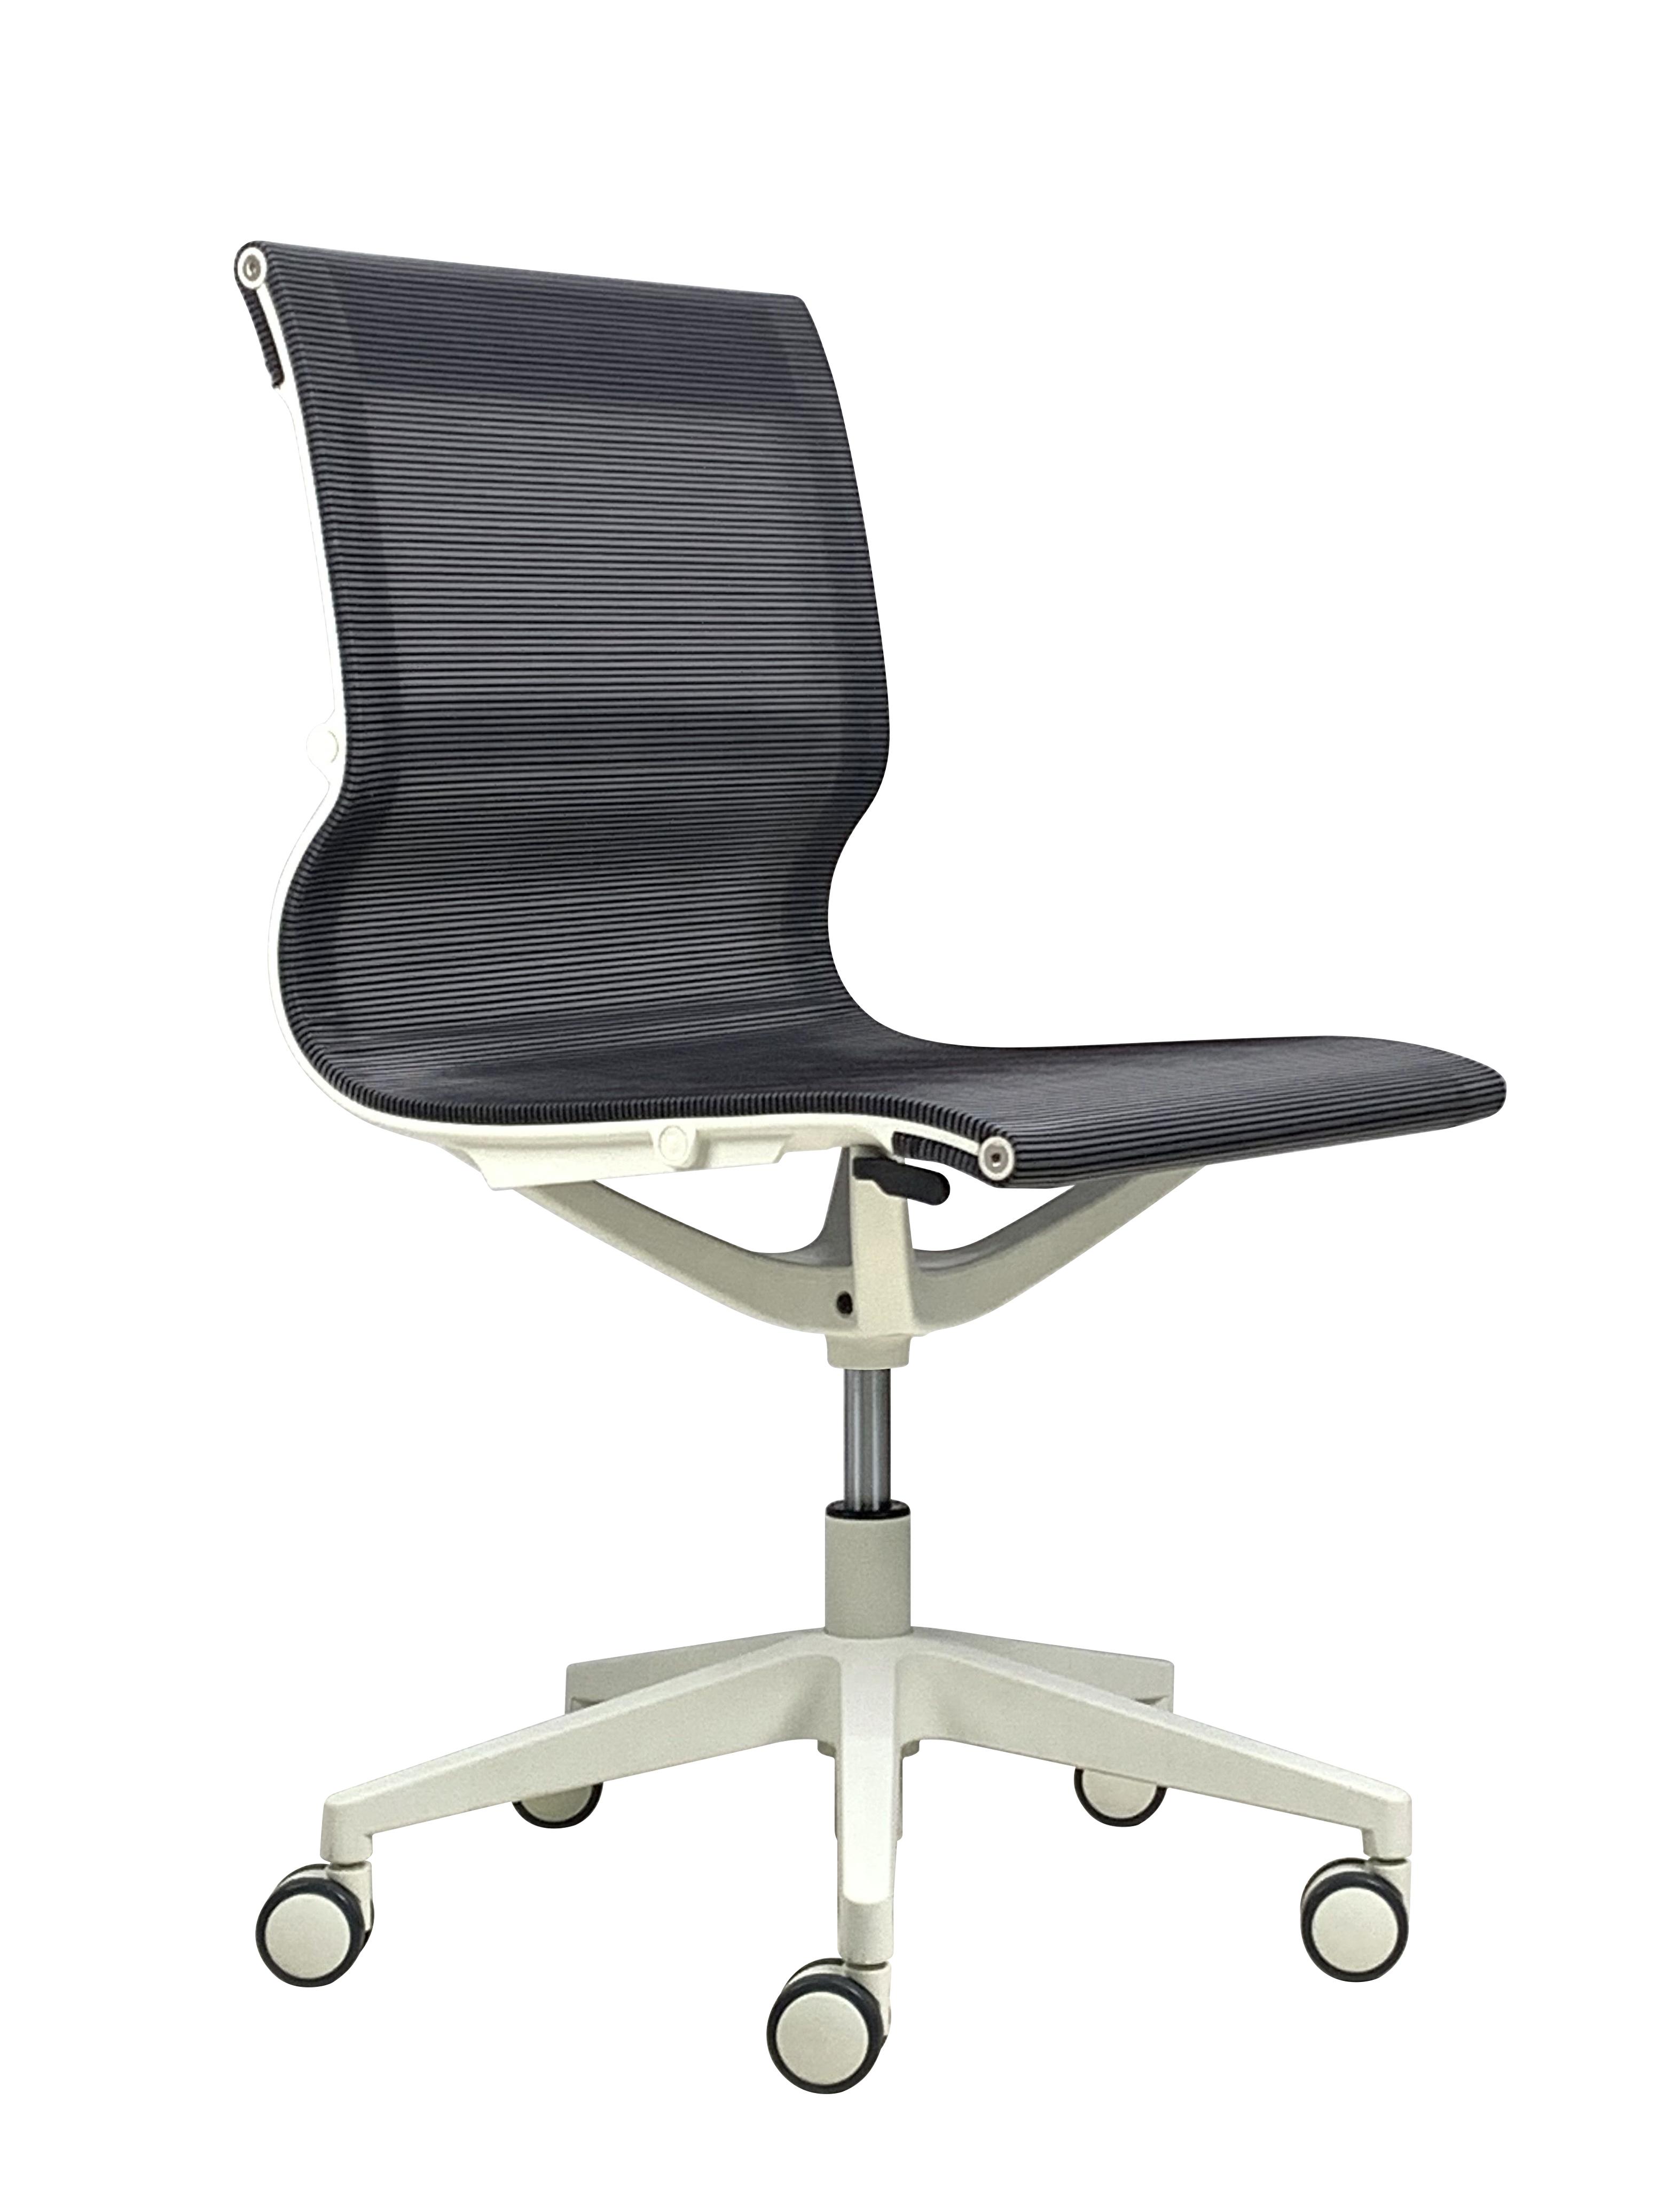 kinetic chair -  angled view